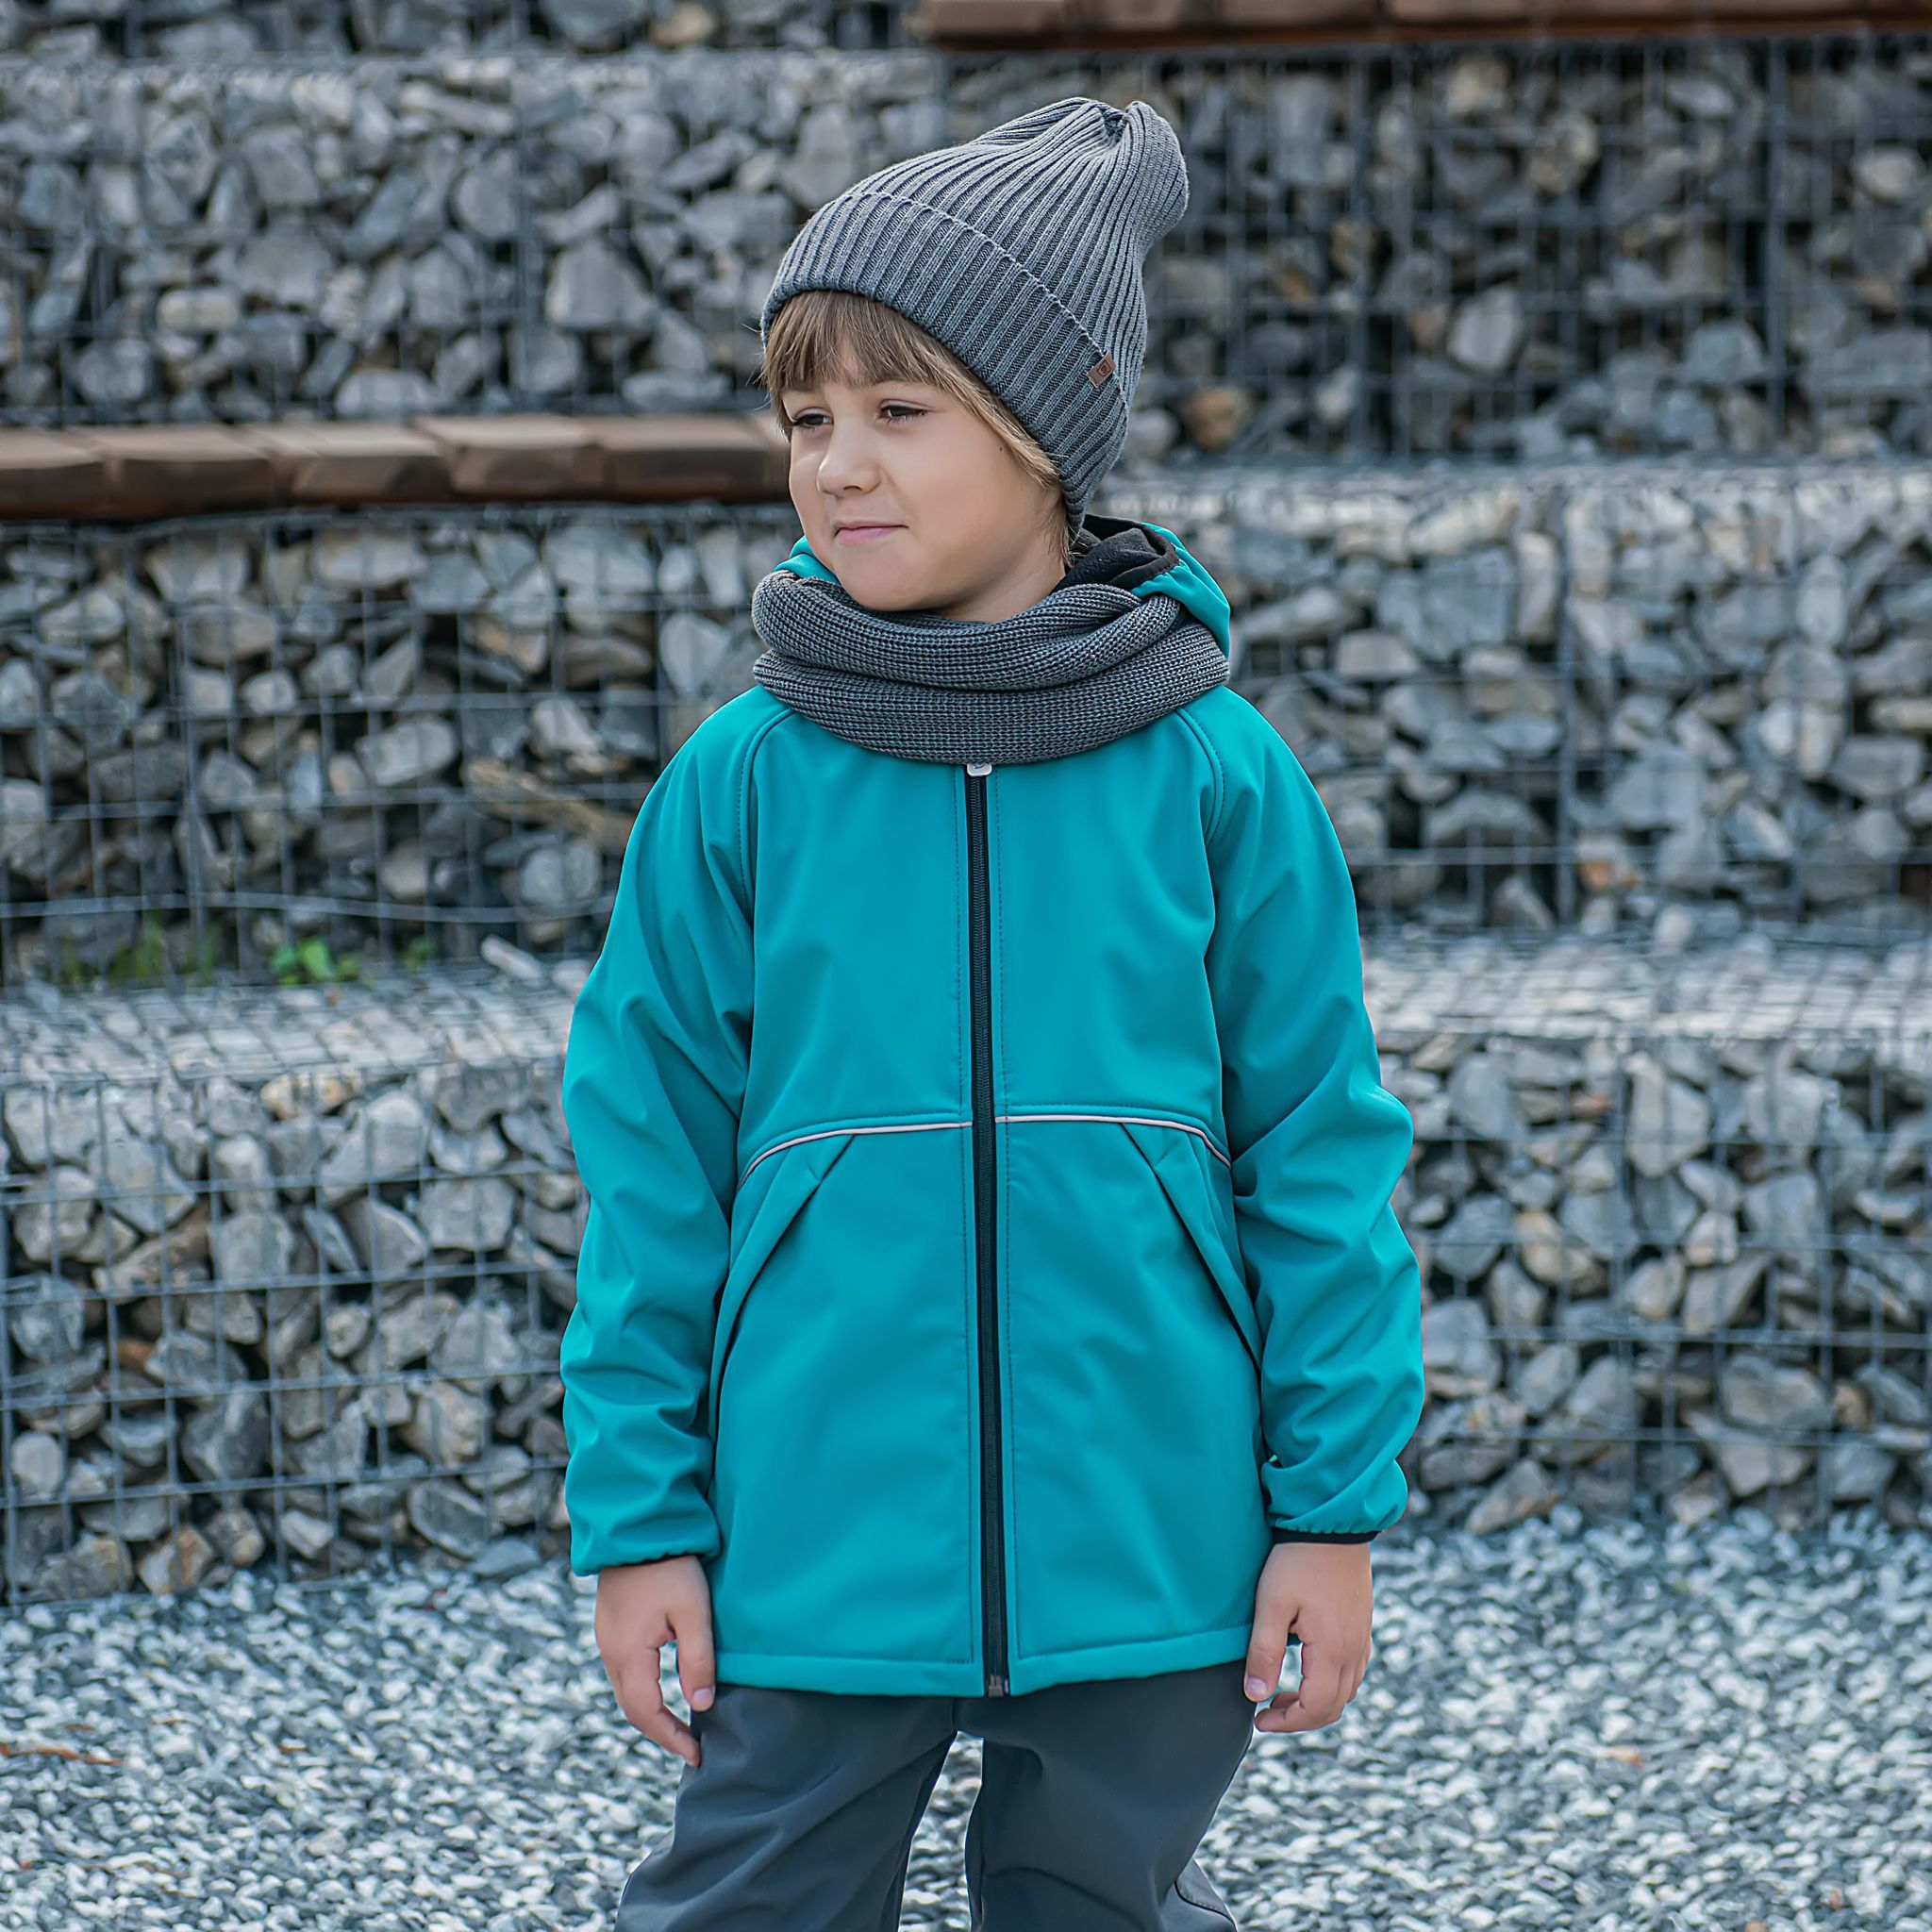 Softshell demi-season jacket for teens - Emerald